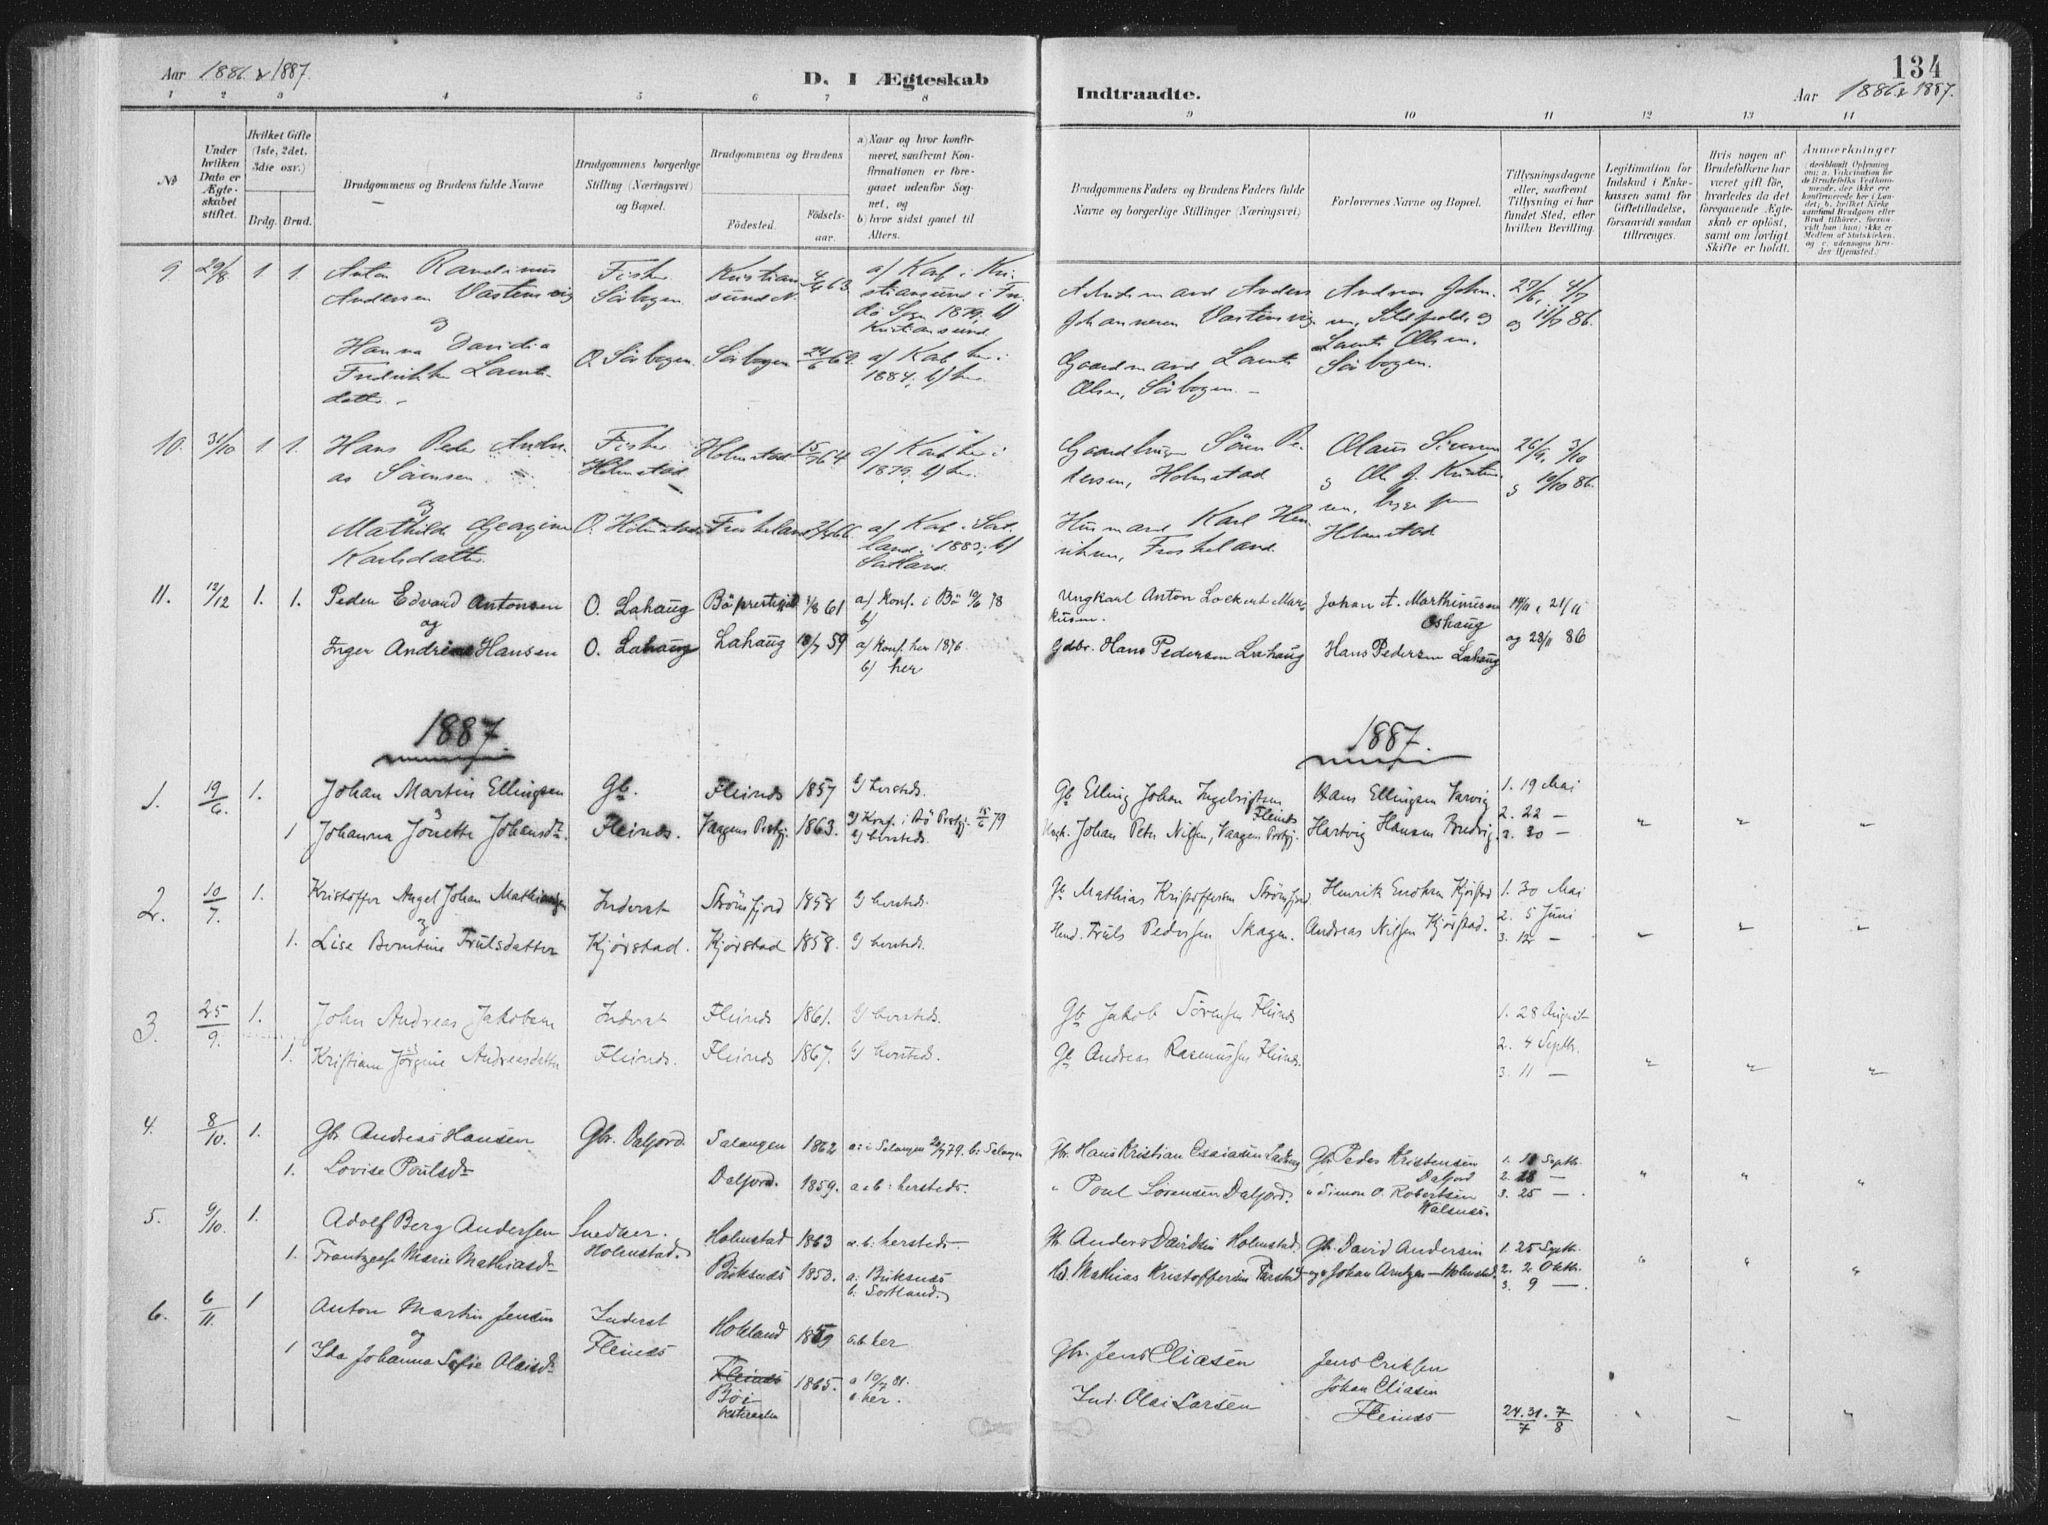 SAT, Ministerialprotokoller, klokkerbøker og fødselsregistre - Nordland, 890/L1286: Ministerialbok nr. 890A01, 1882-1902, s. 134